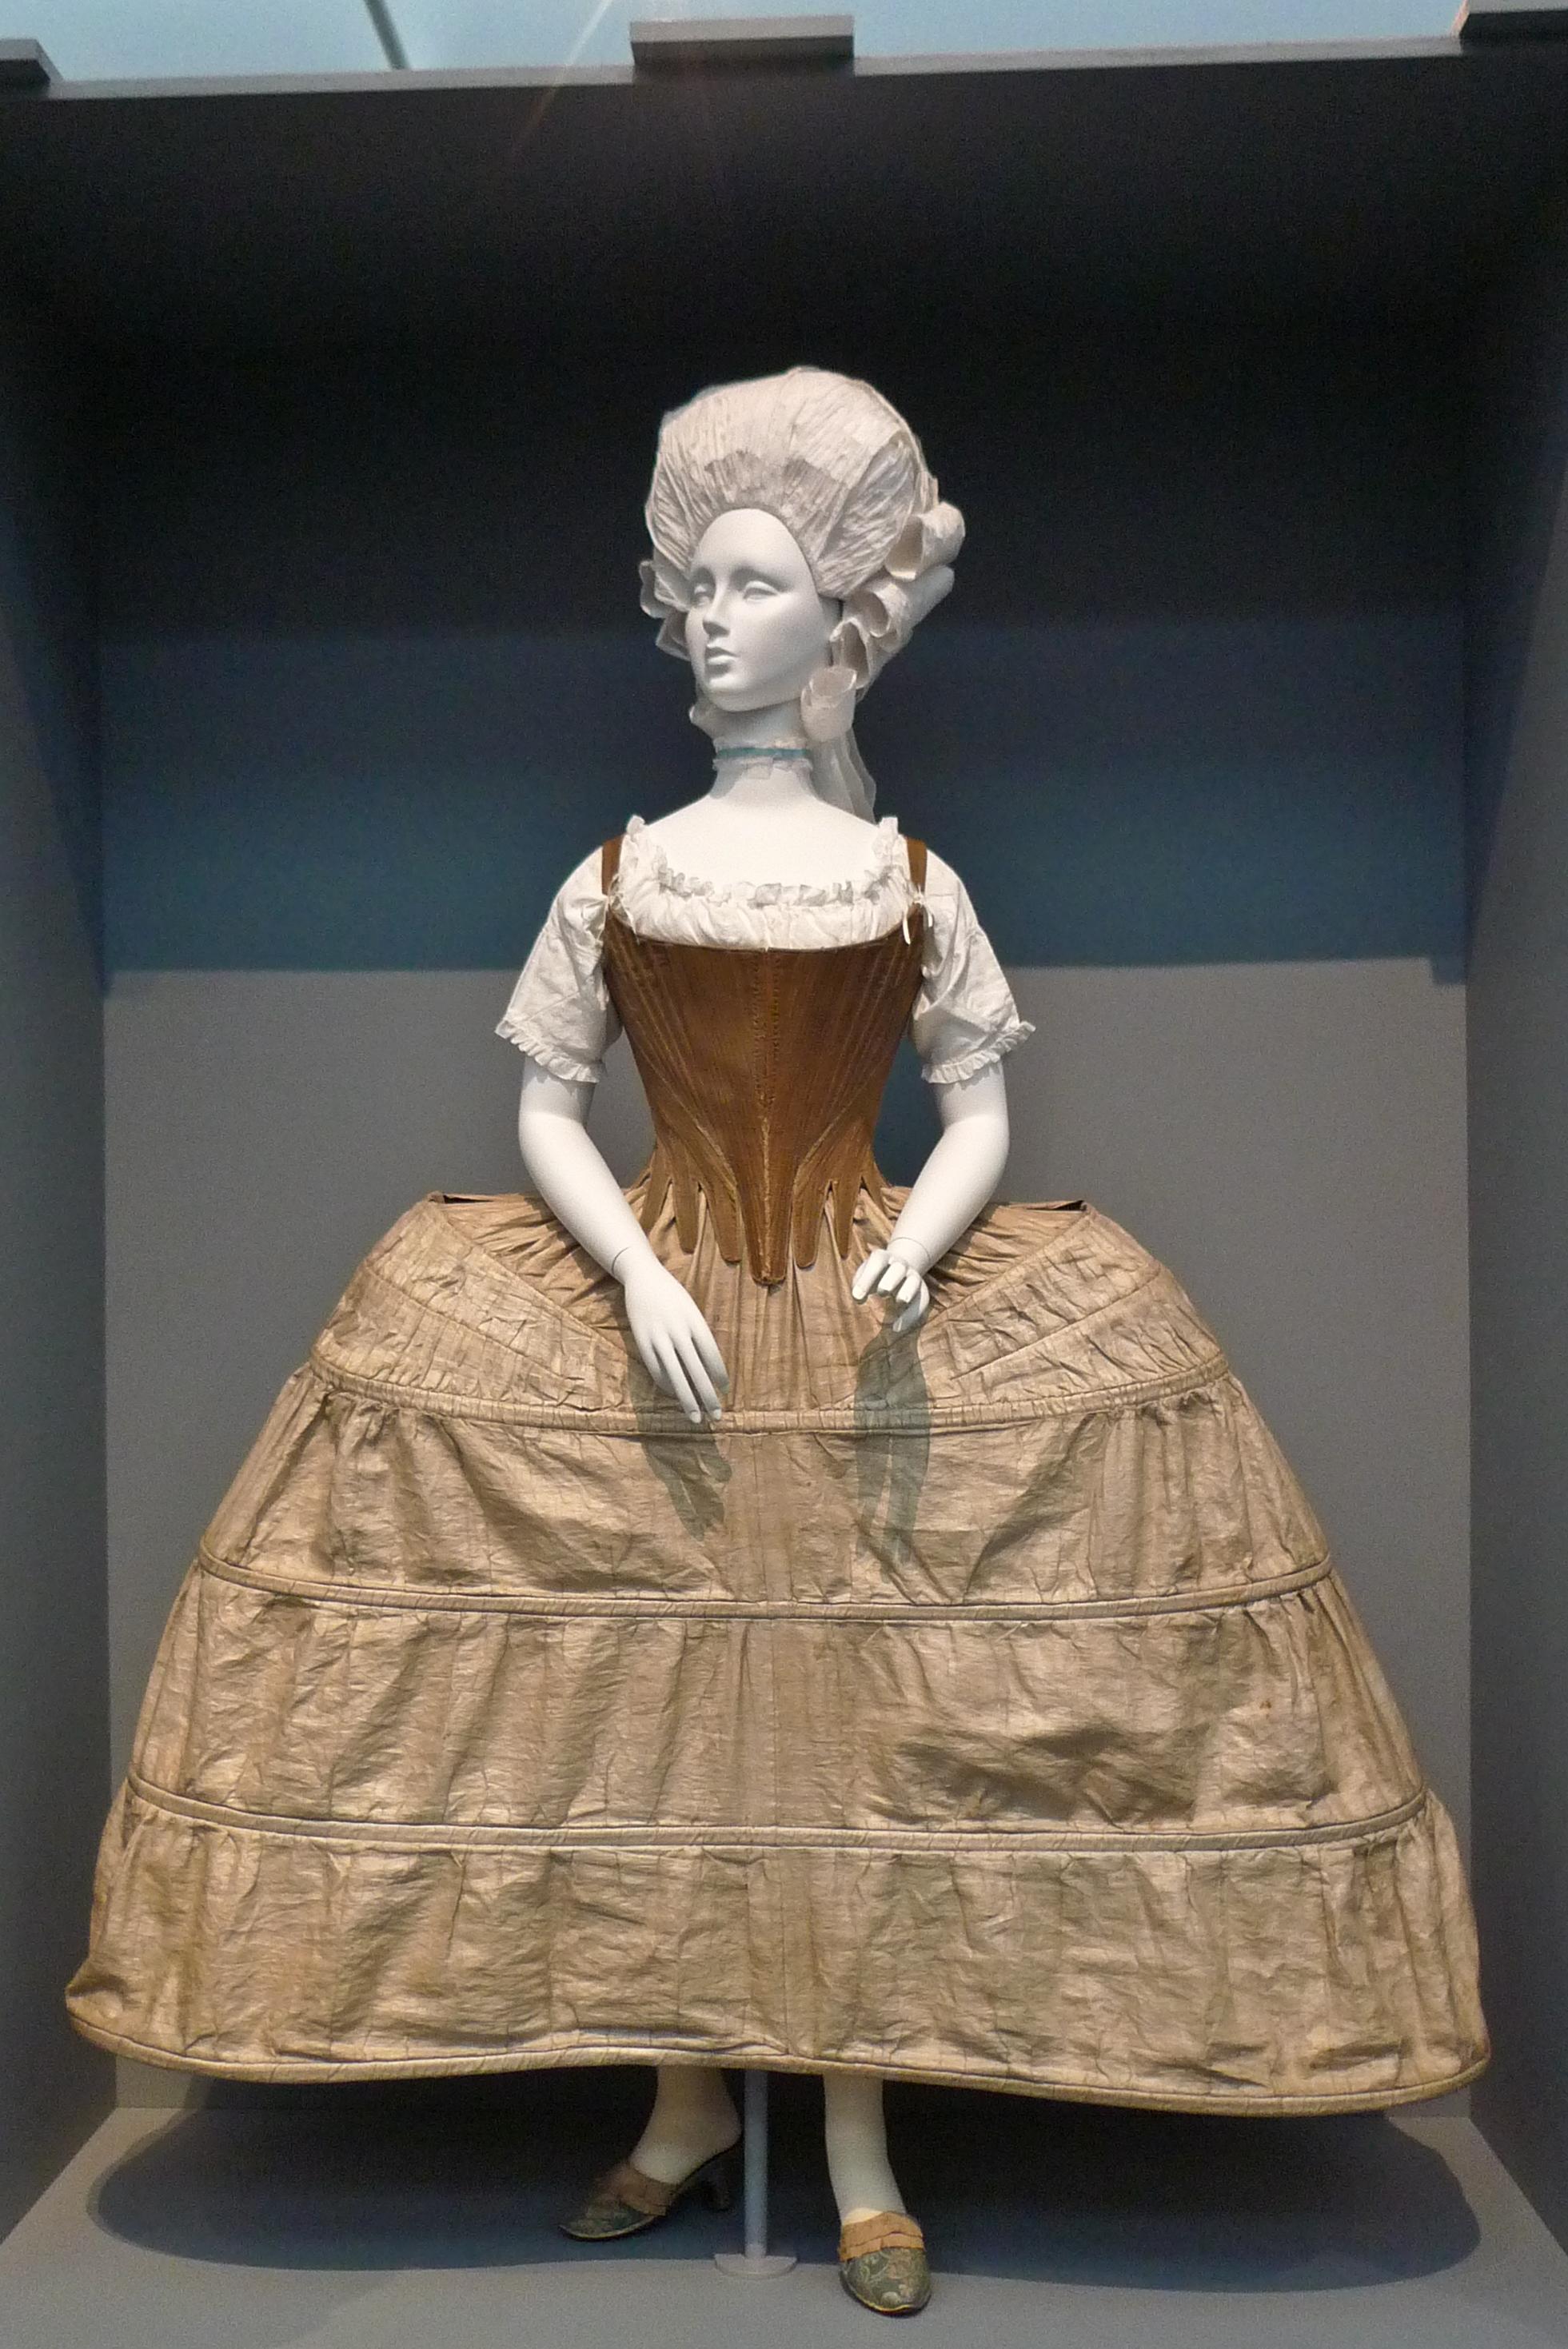 File:Hoop petticoat and corset England 1750-1780 LACMA.jpg